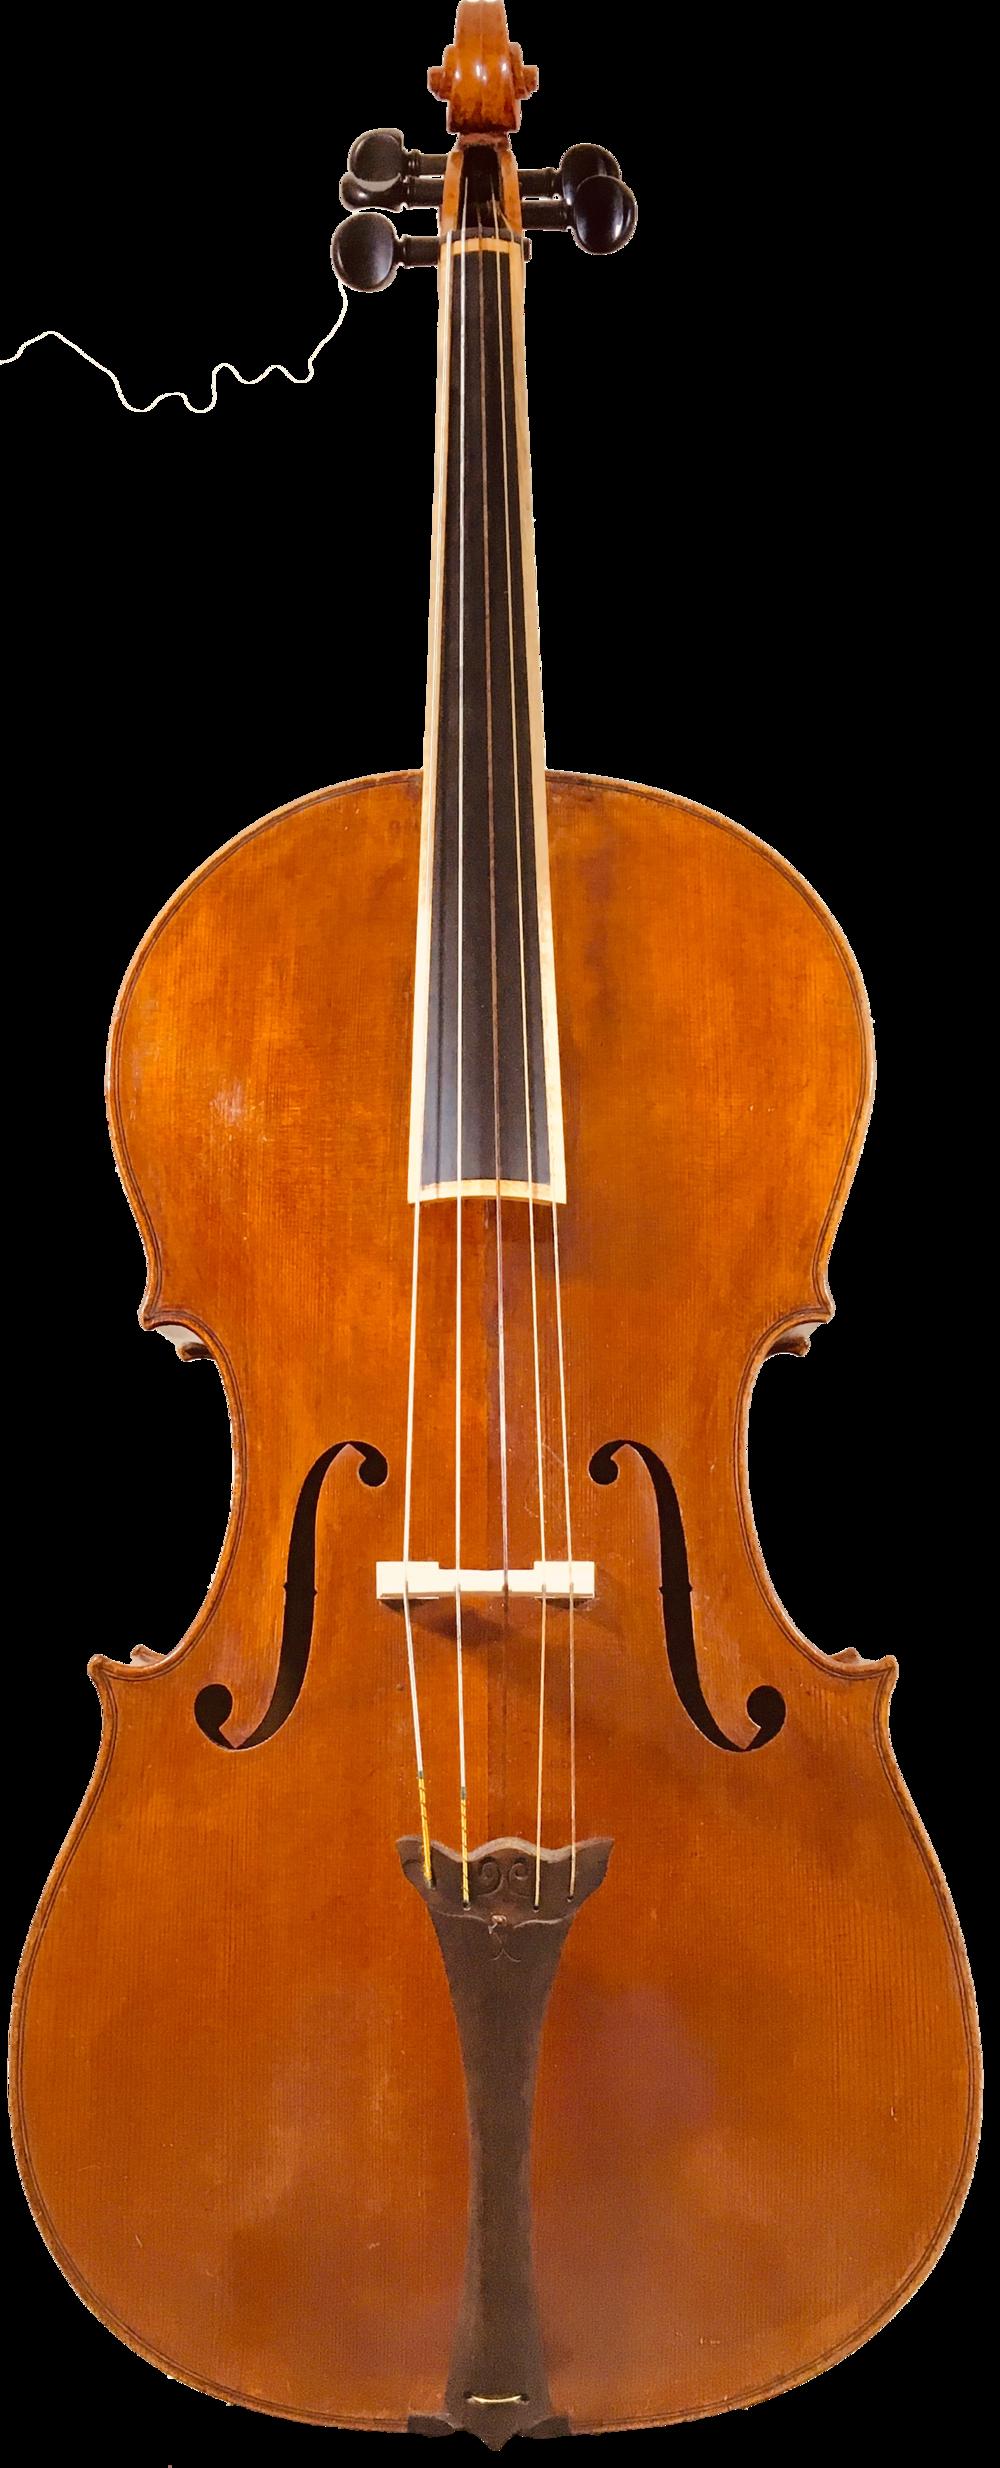 5-String-cello-piccolo-chelo-Detmar-Leertouwer-Tanja-Brandon-.png